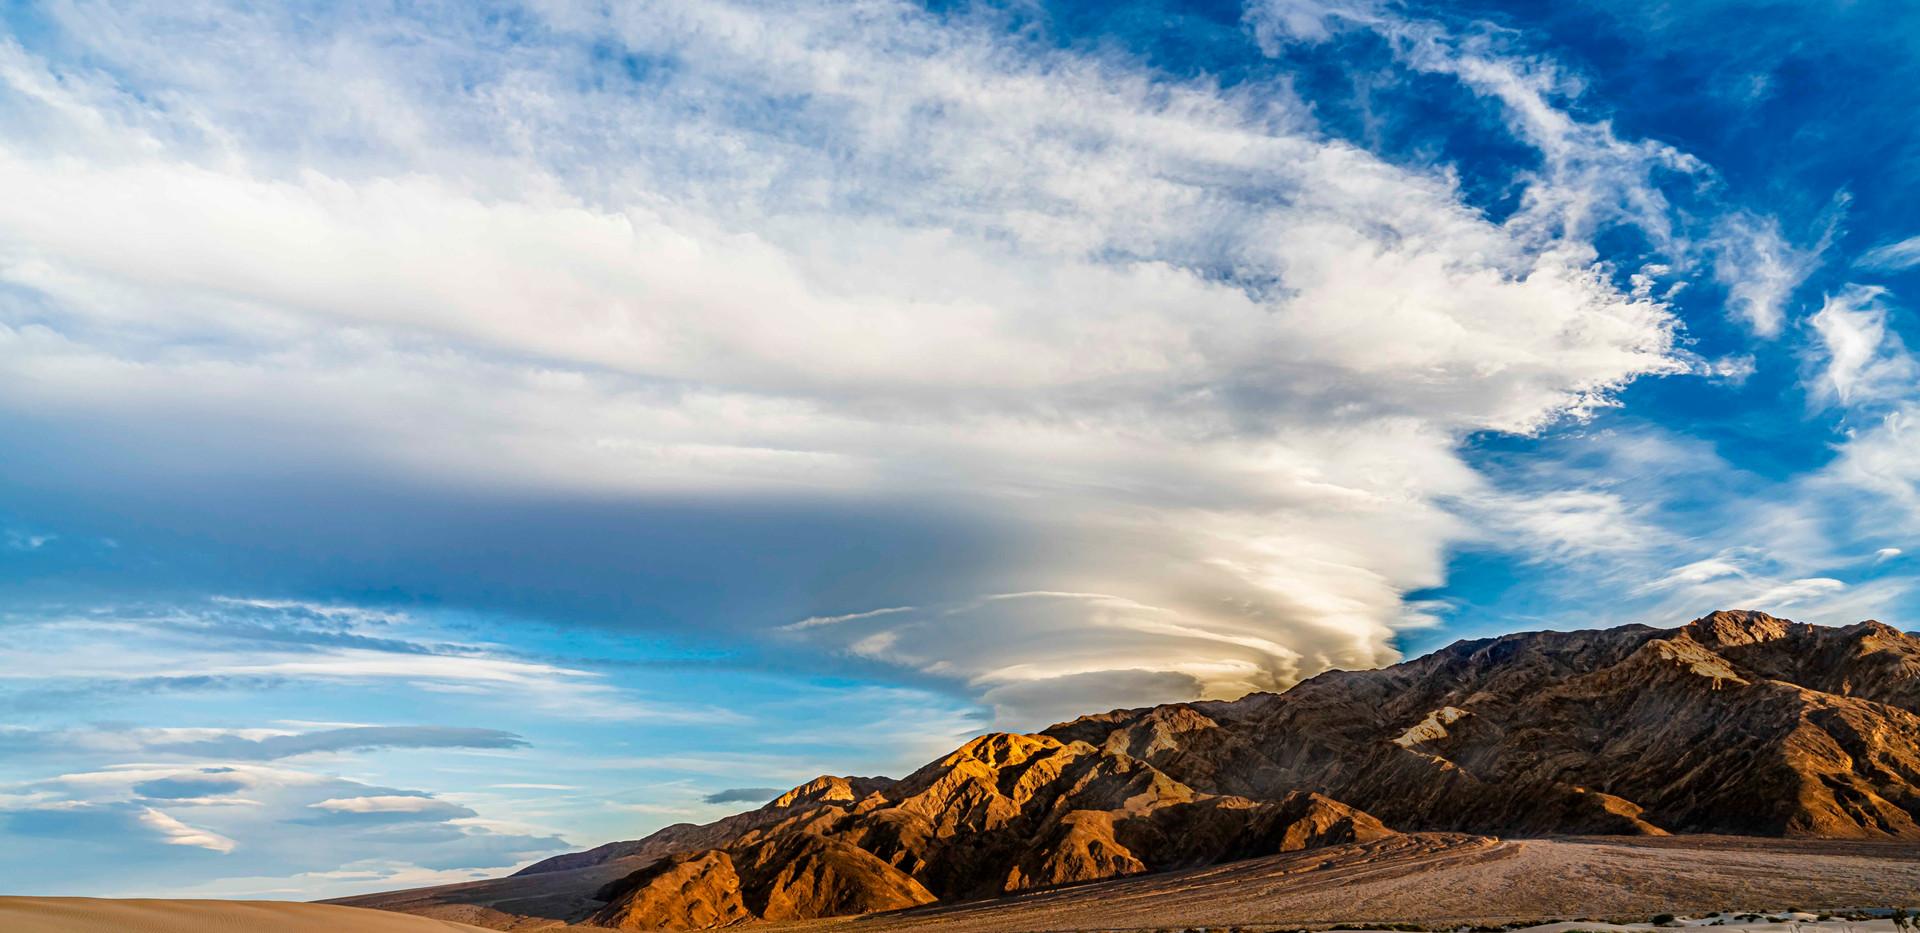 Lenticular Cloud, Death Valley